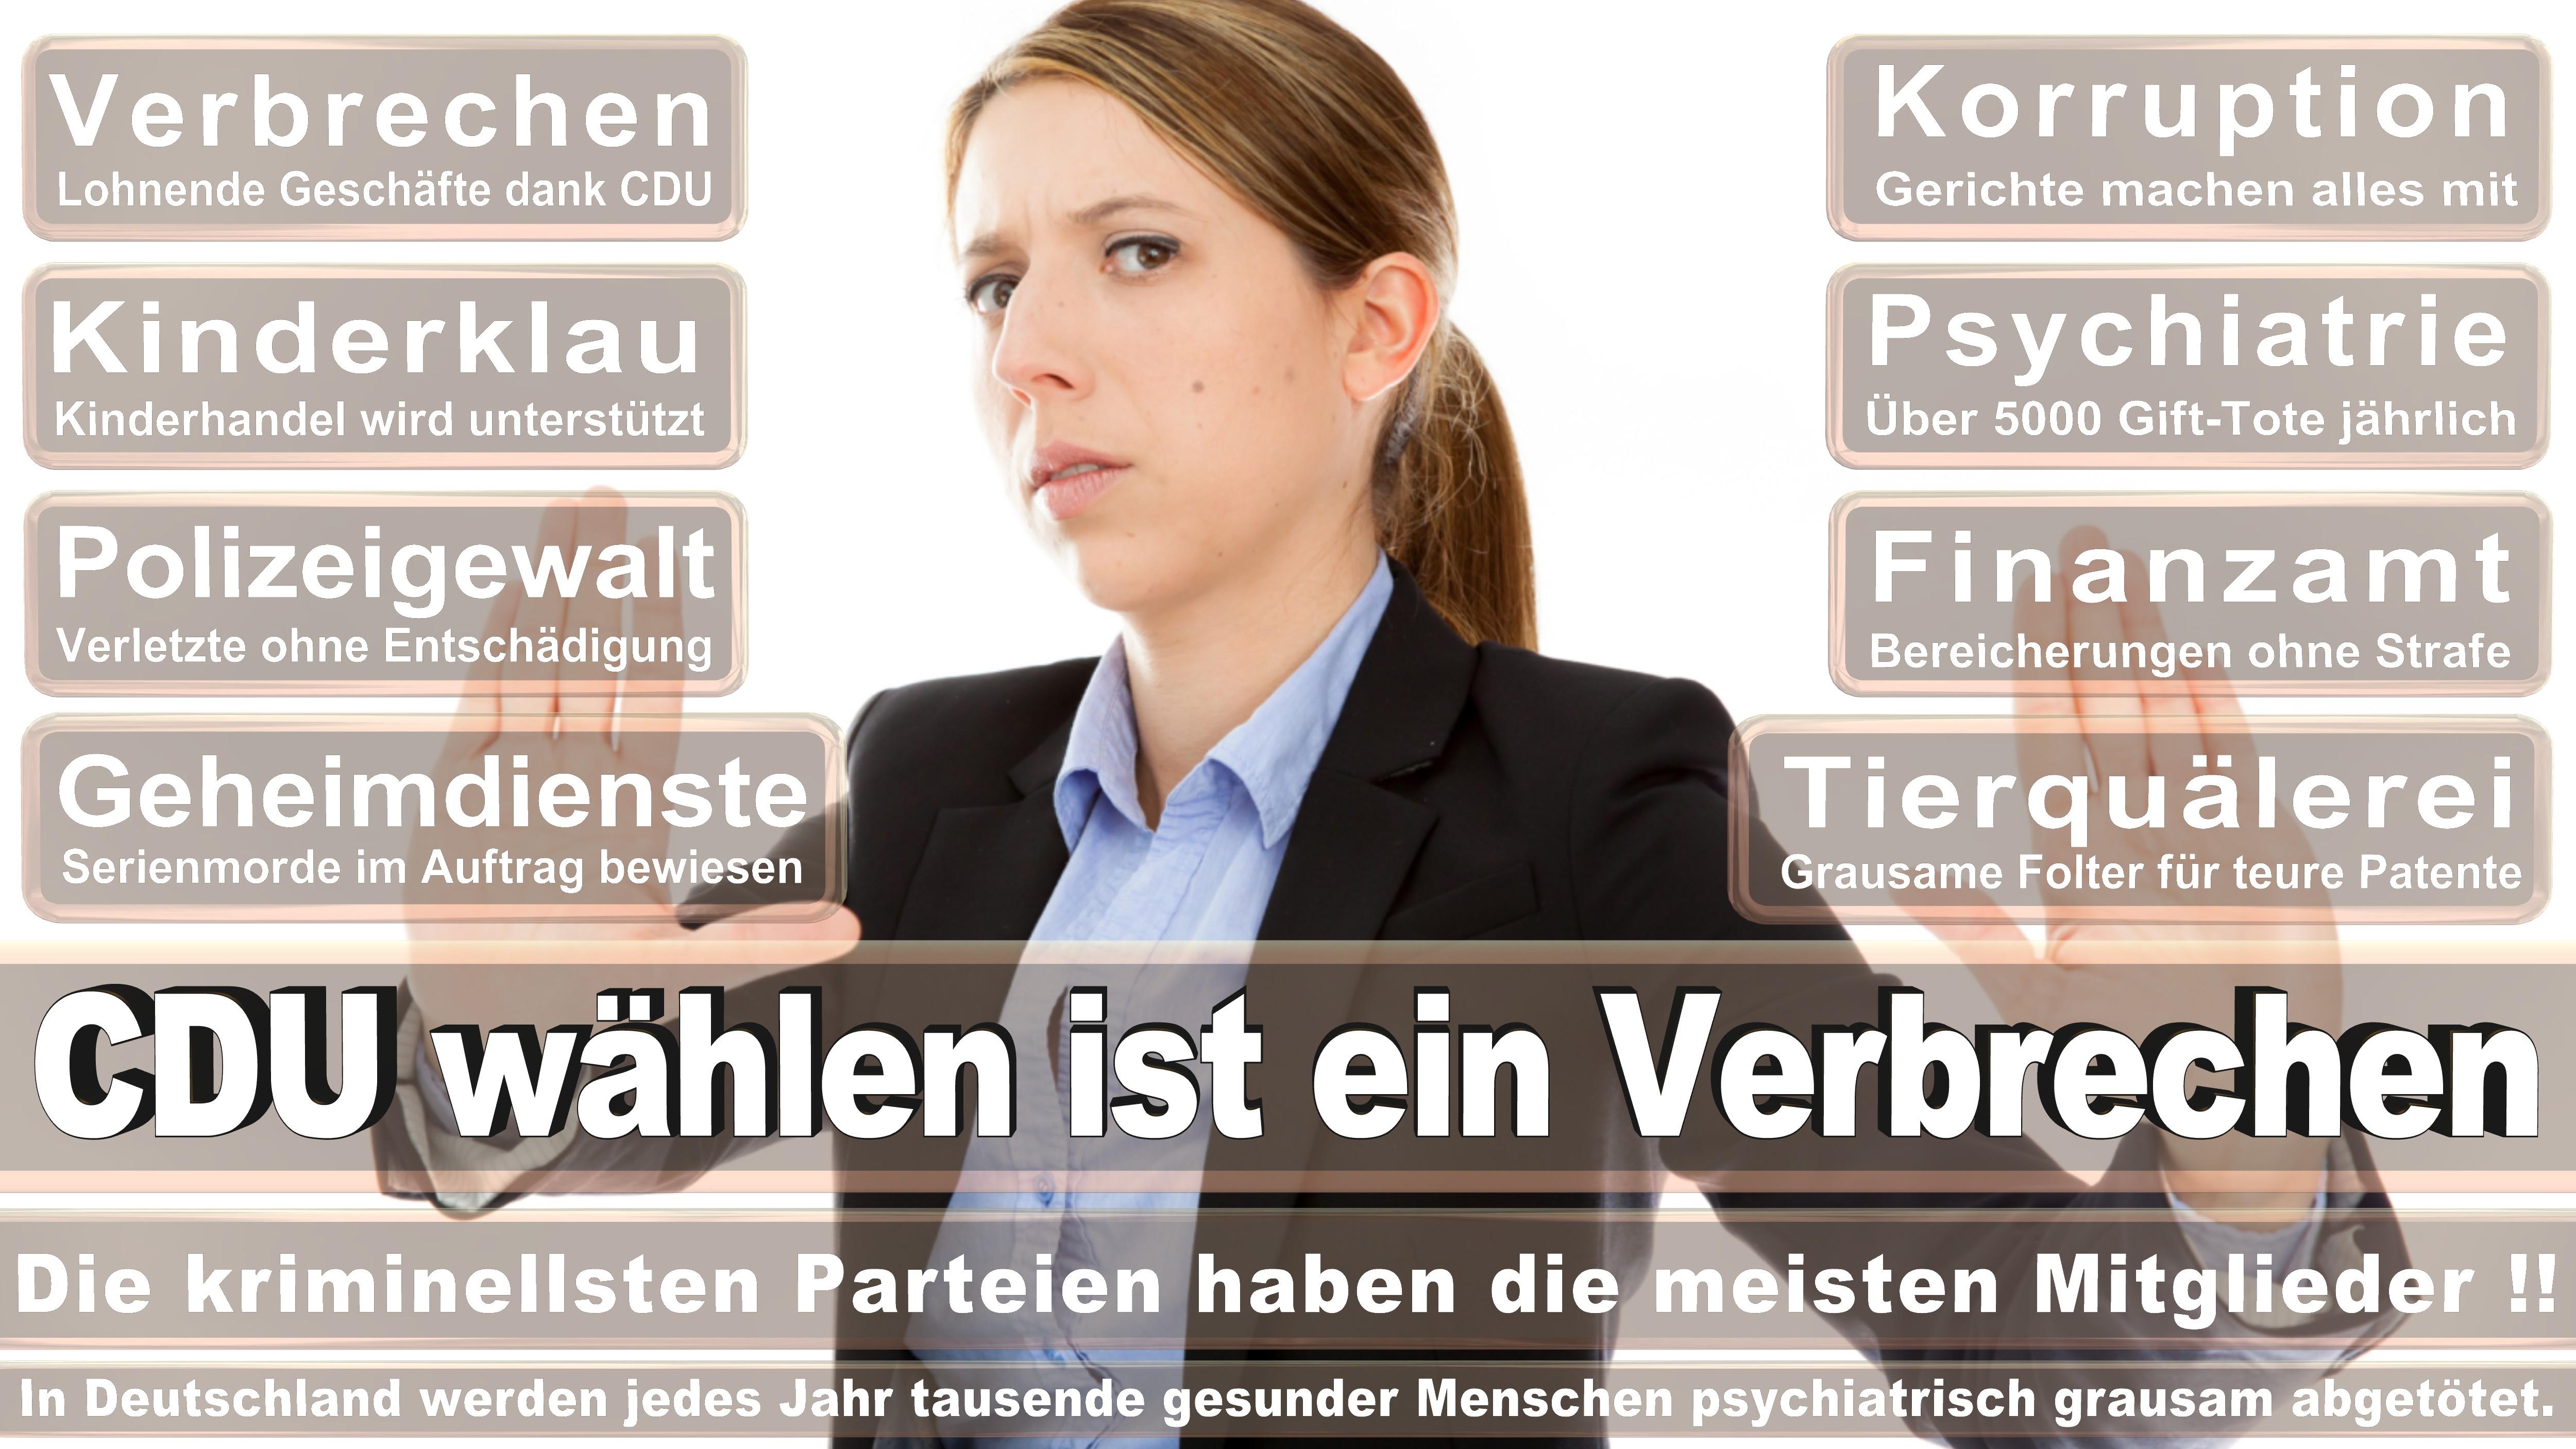 Dr Peter Ramsauer CDU CSU Politiker